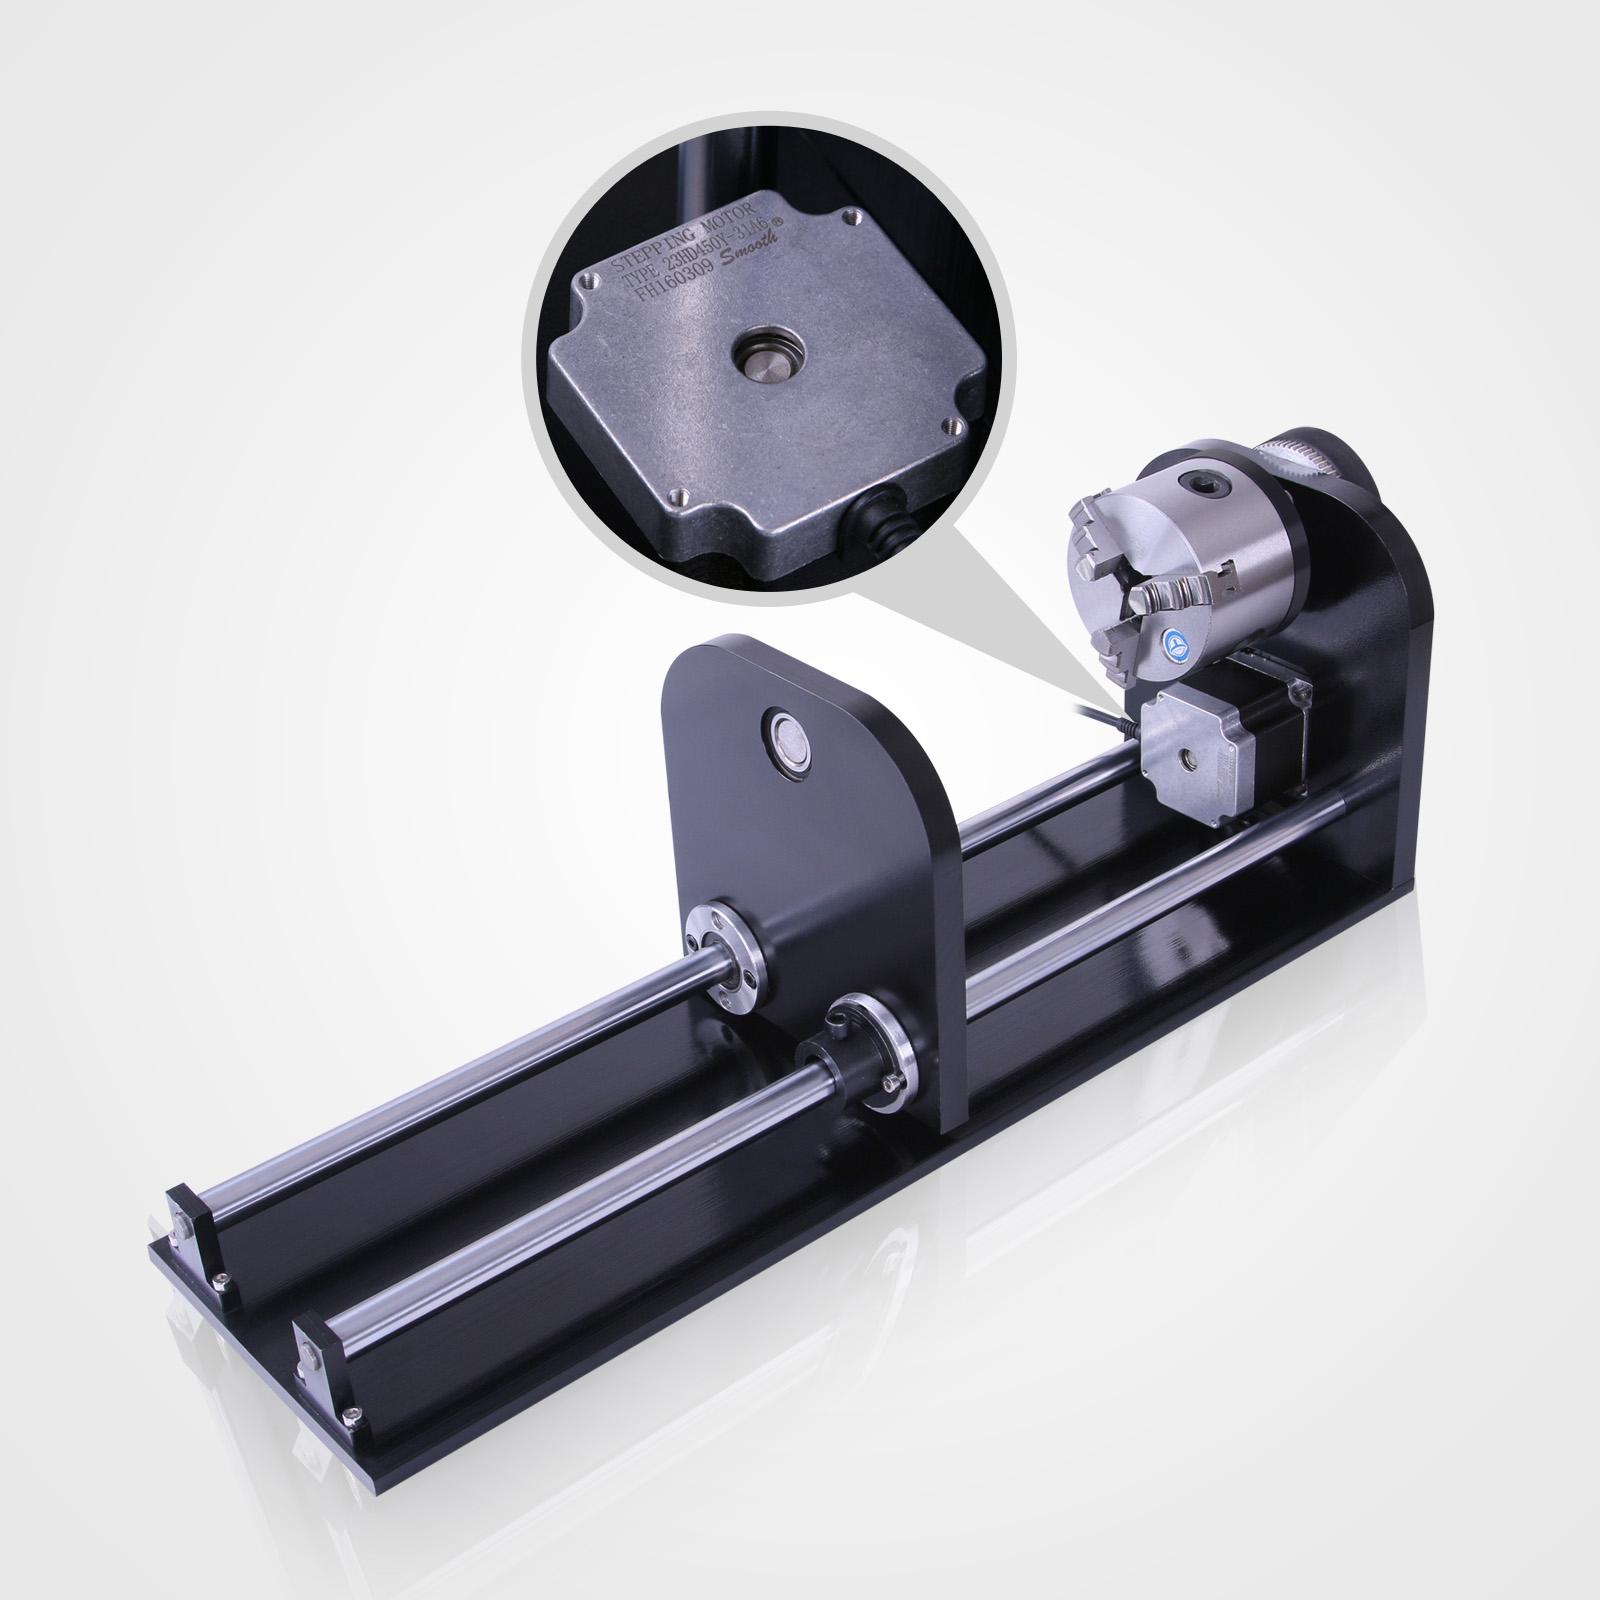 Macchina-per-Incisione-Laser-CO2-40-130W-Asse-Rotante-Tagliatrice-Incisore miniatura 90